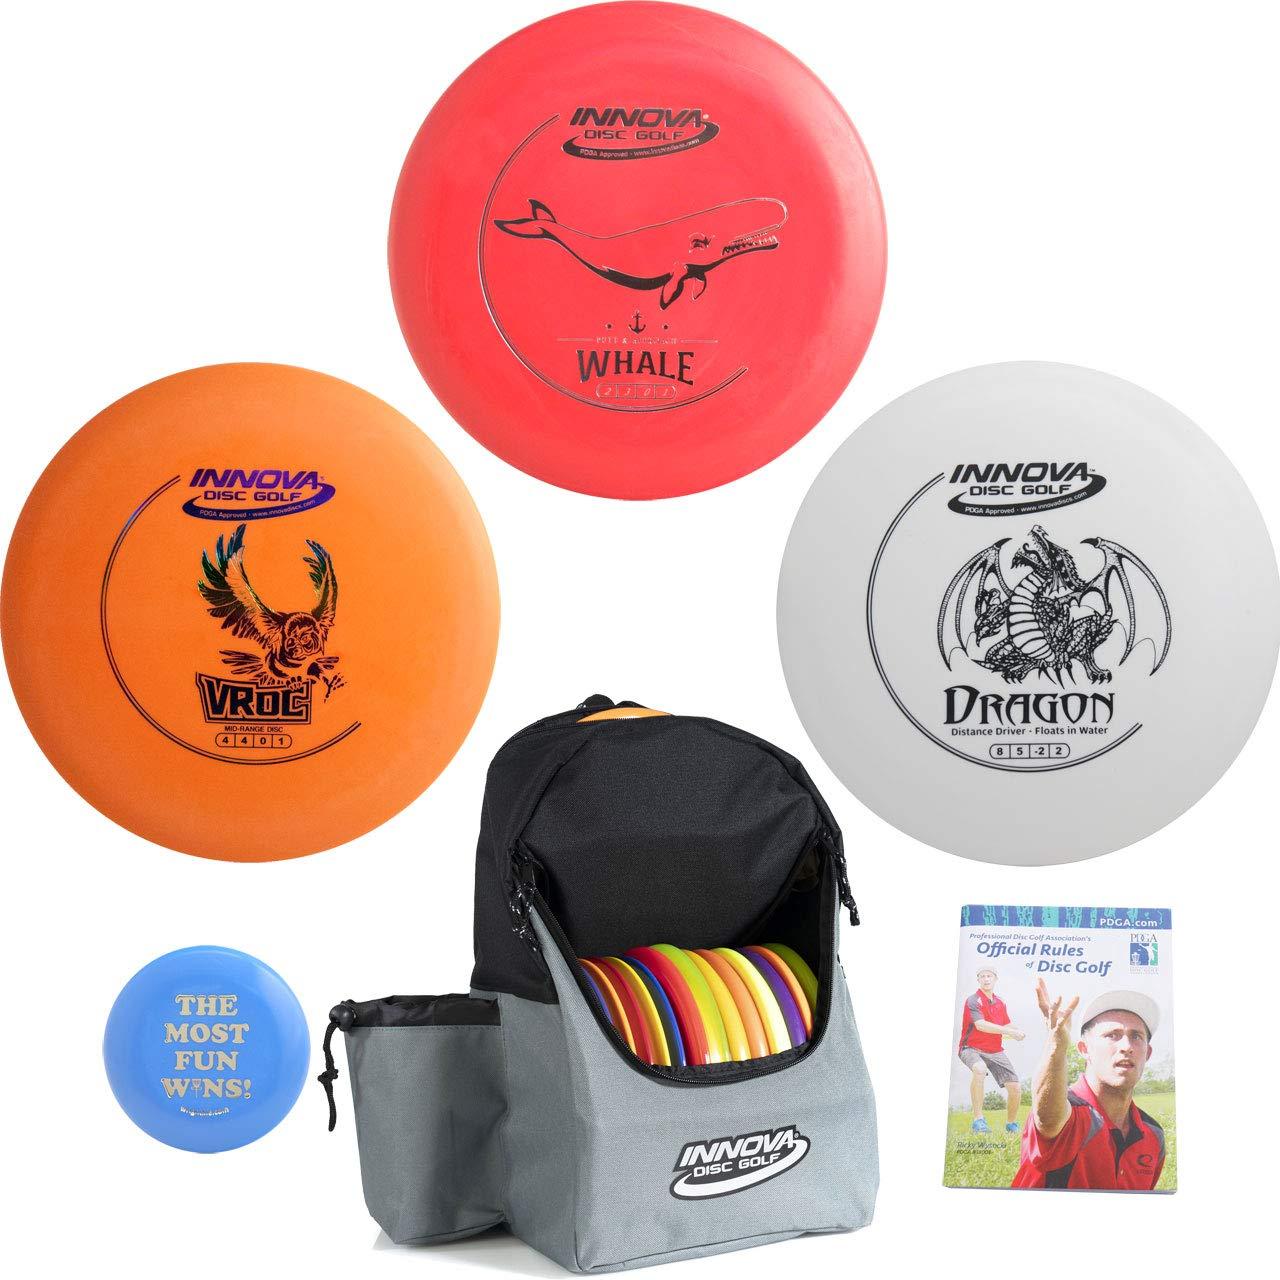 Innova Disc Golf Complete Gift Set Bundle - Discover Backpack Bag, Floating Driver, Mid-Range, Putter + Marker Mini Disc Rules (6 Items) (Red/Gray) by Innova Disc Golf